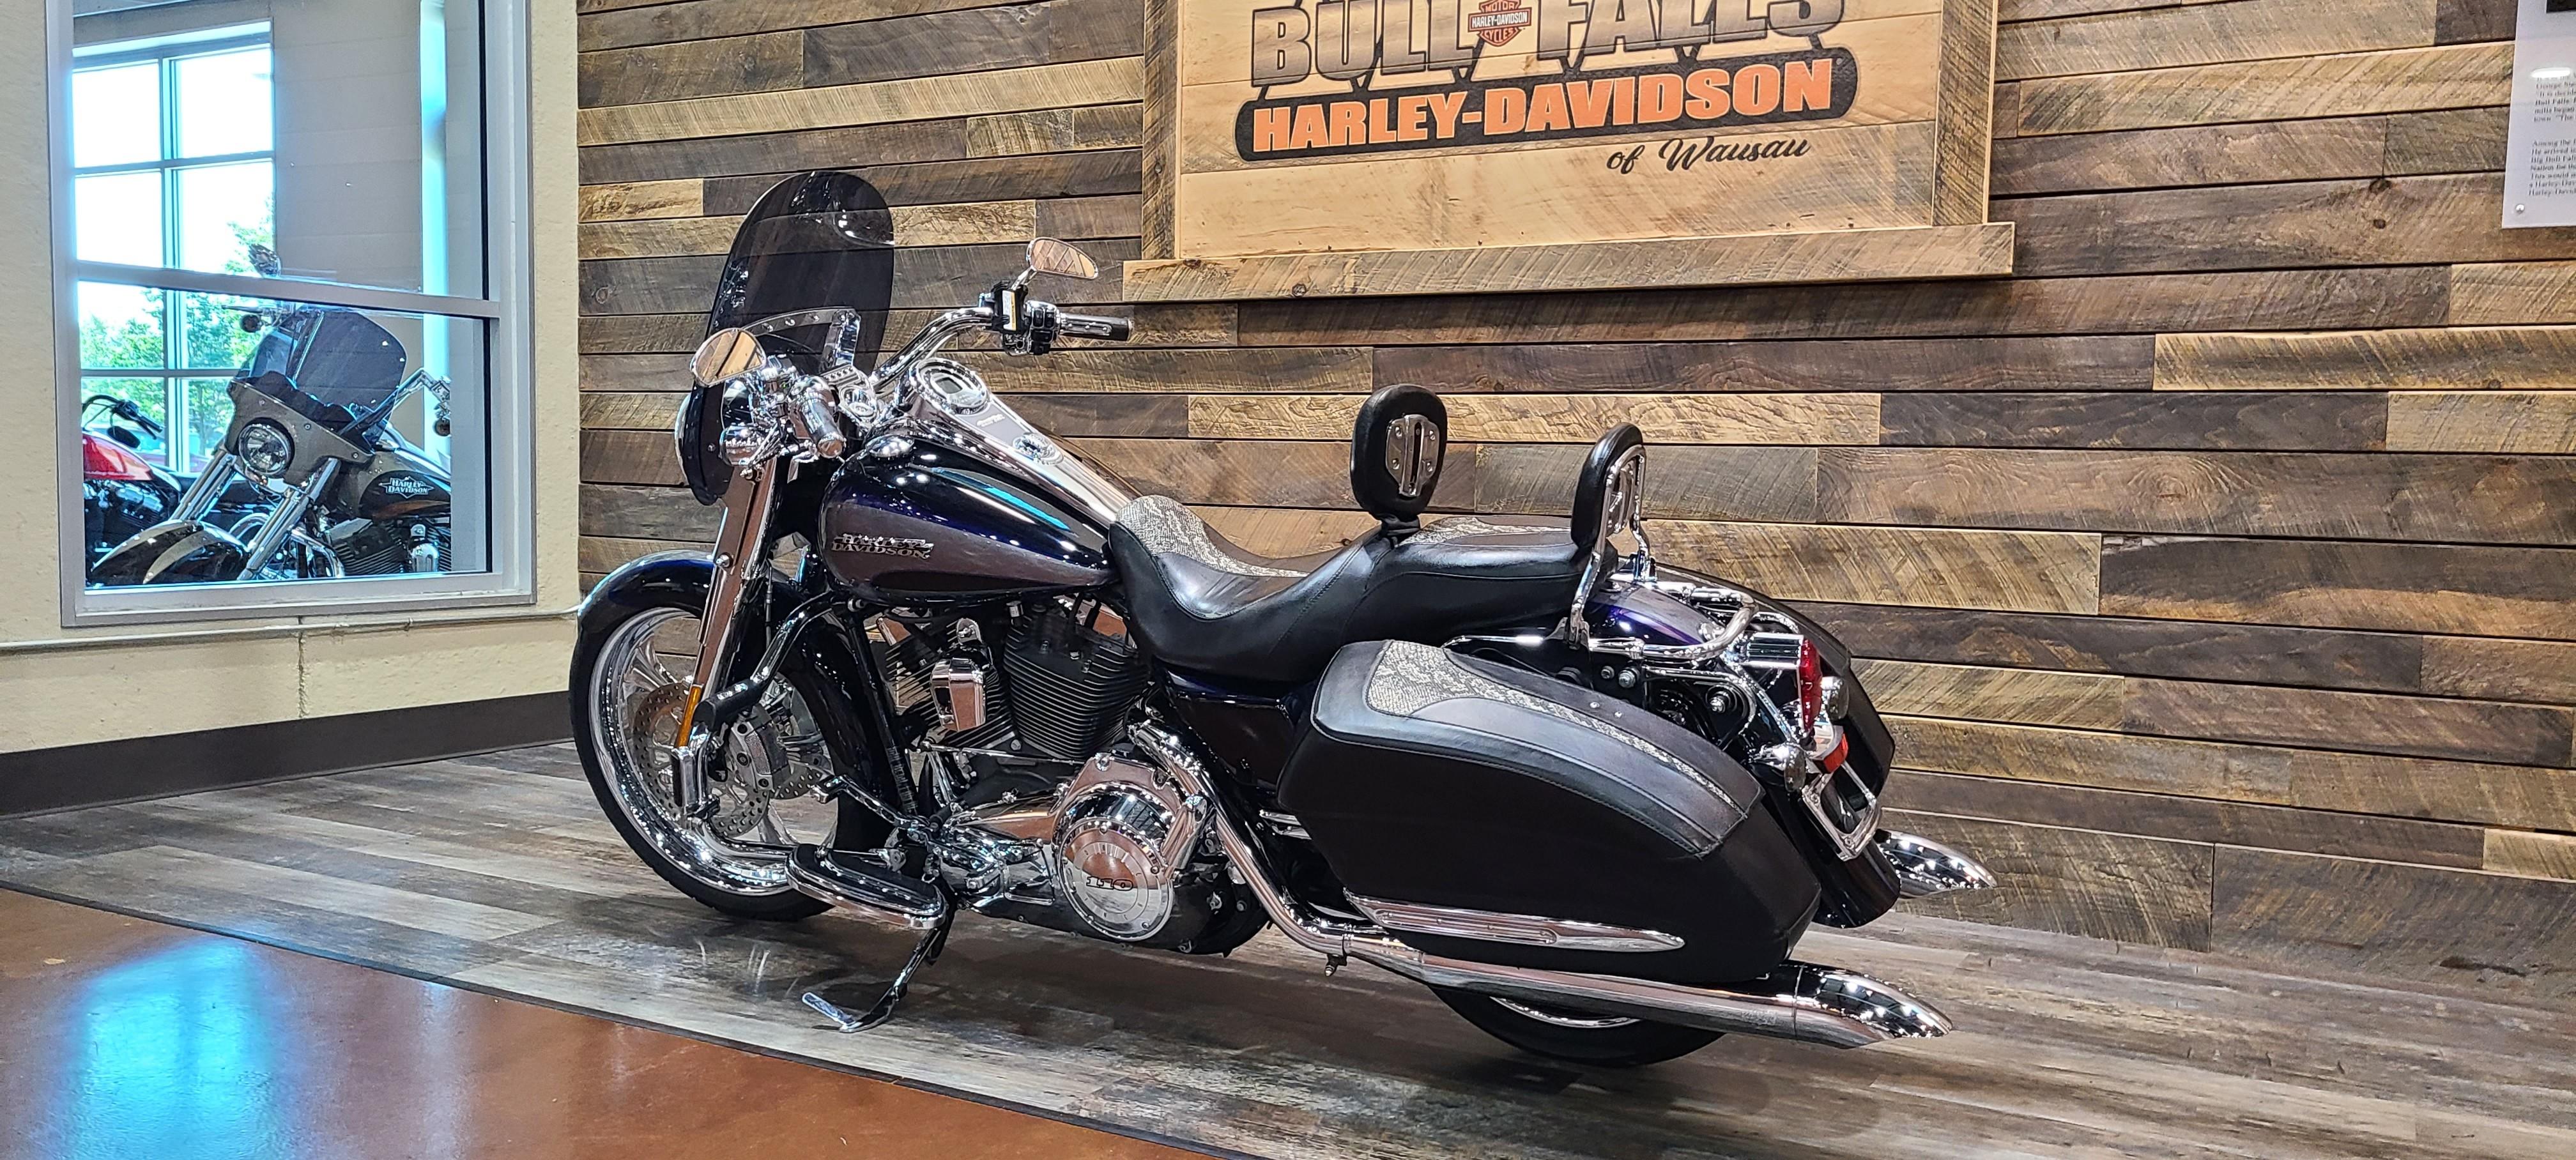 2008 Harley-Davidson FLHRSE4 at Bull Falls Harley-Davidson